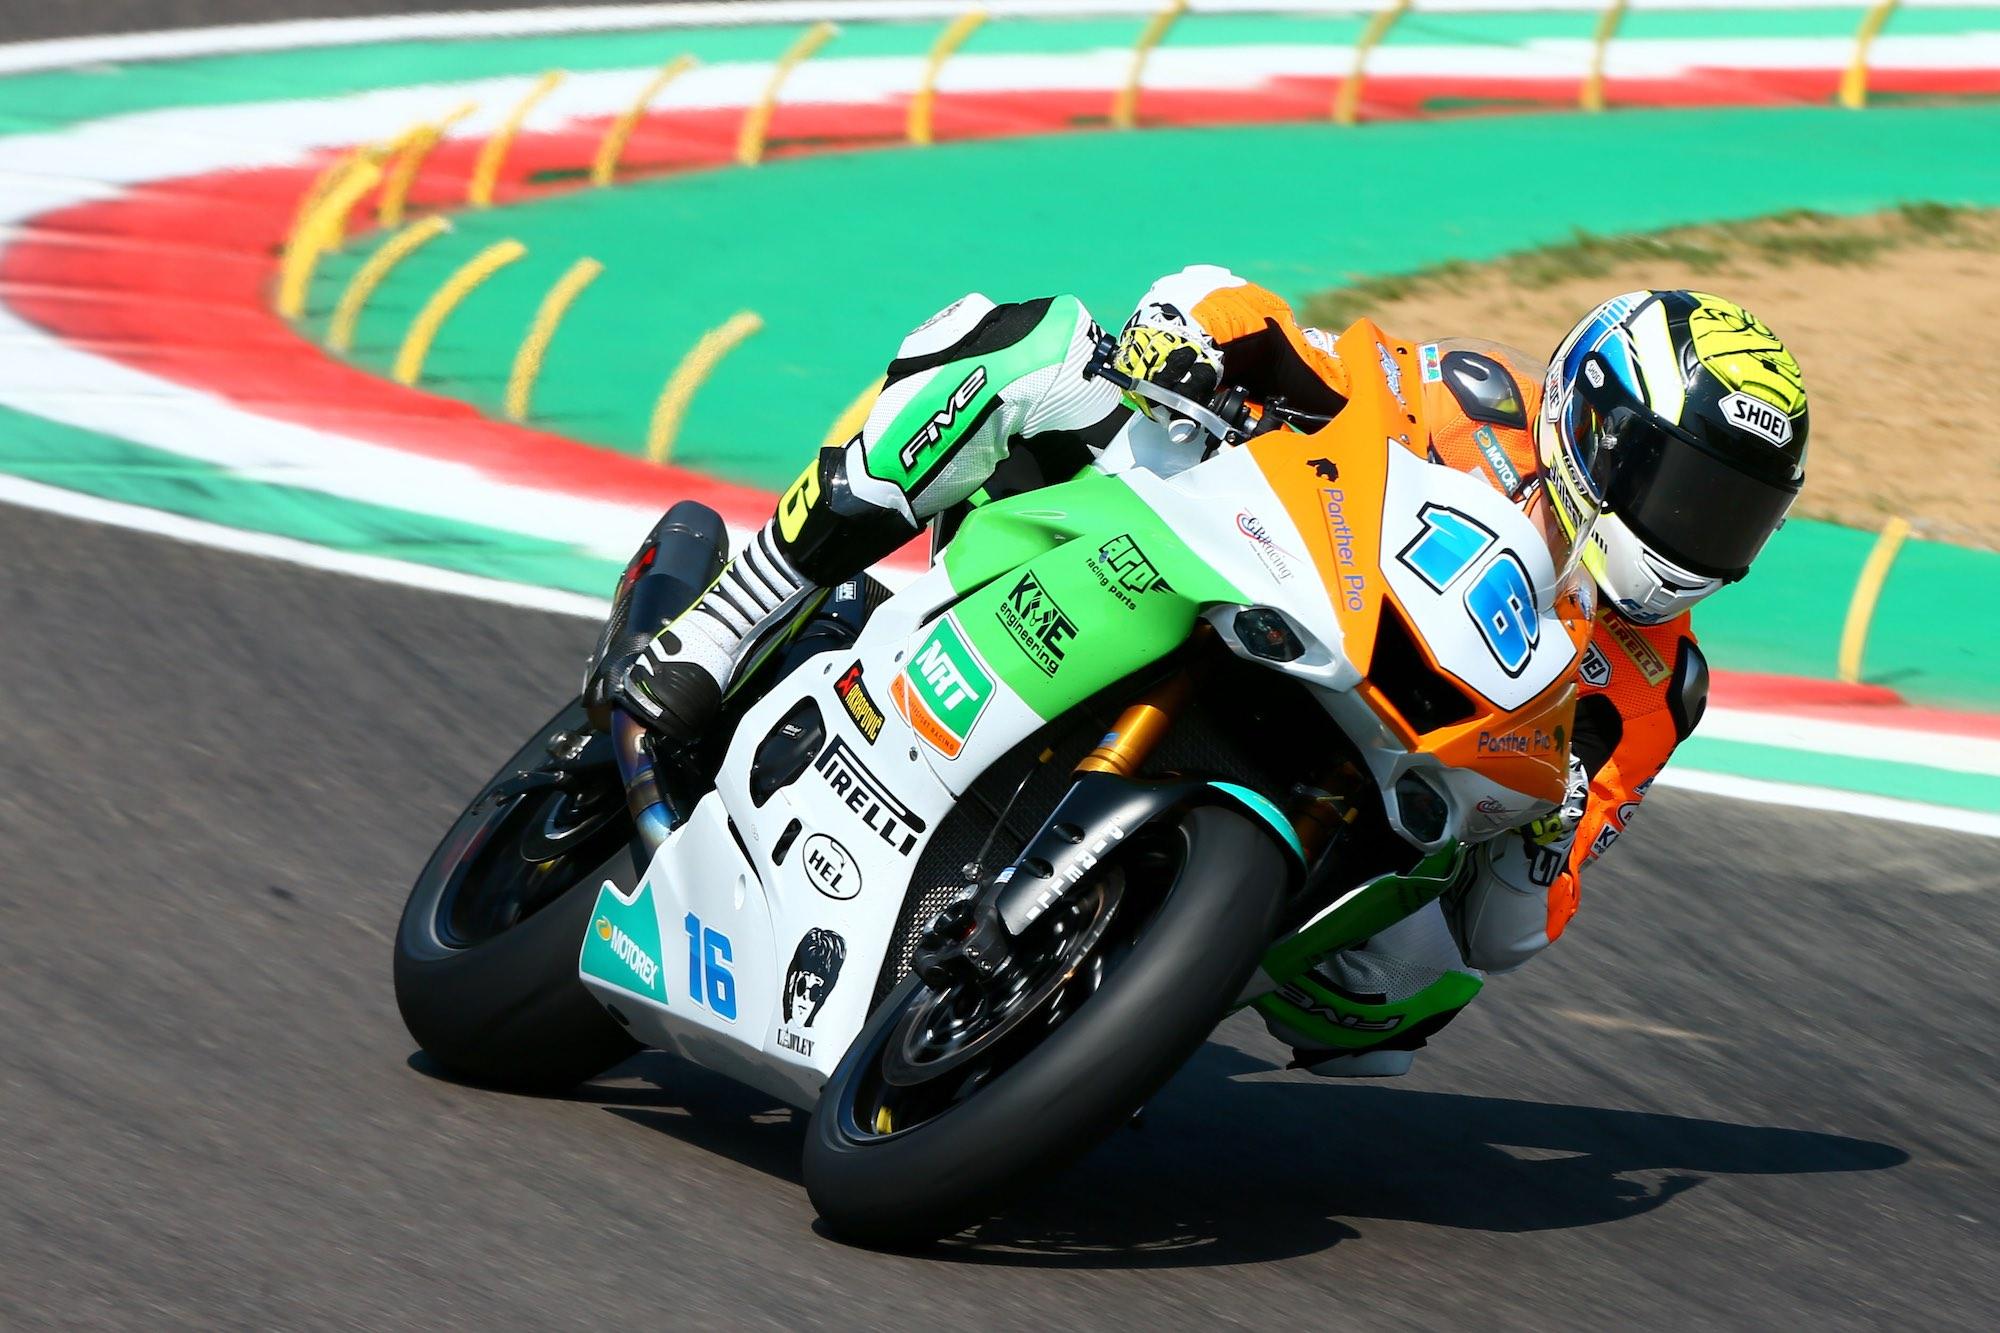 Jules Cluzel domina Imola en una carrera sin Kenan Sofuoglu